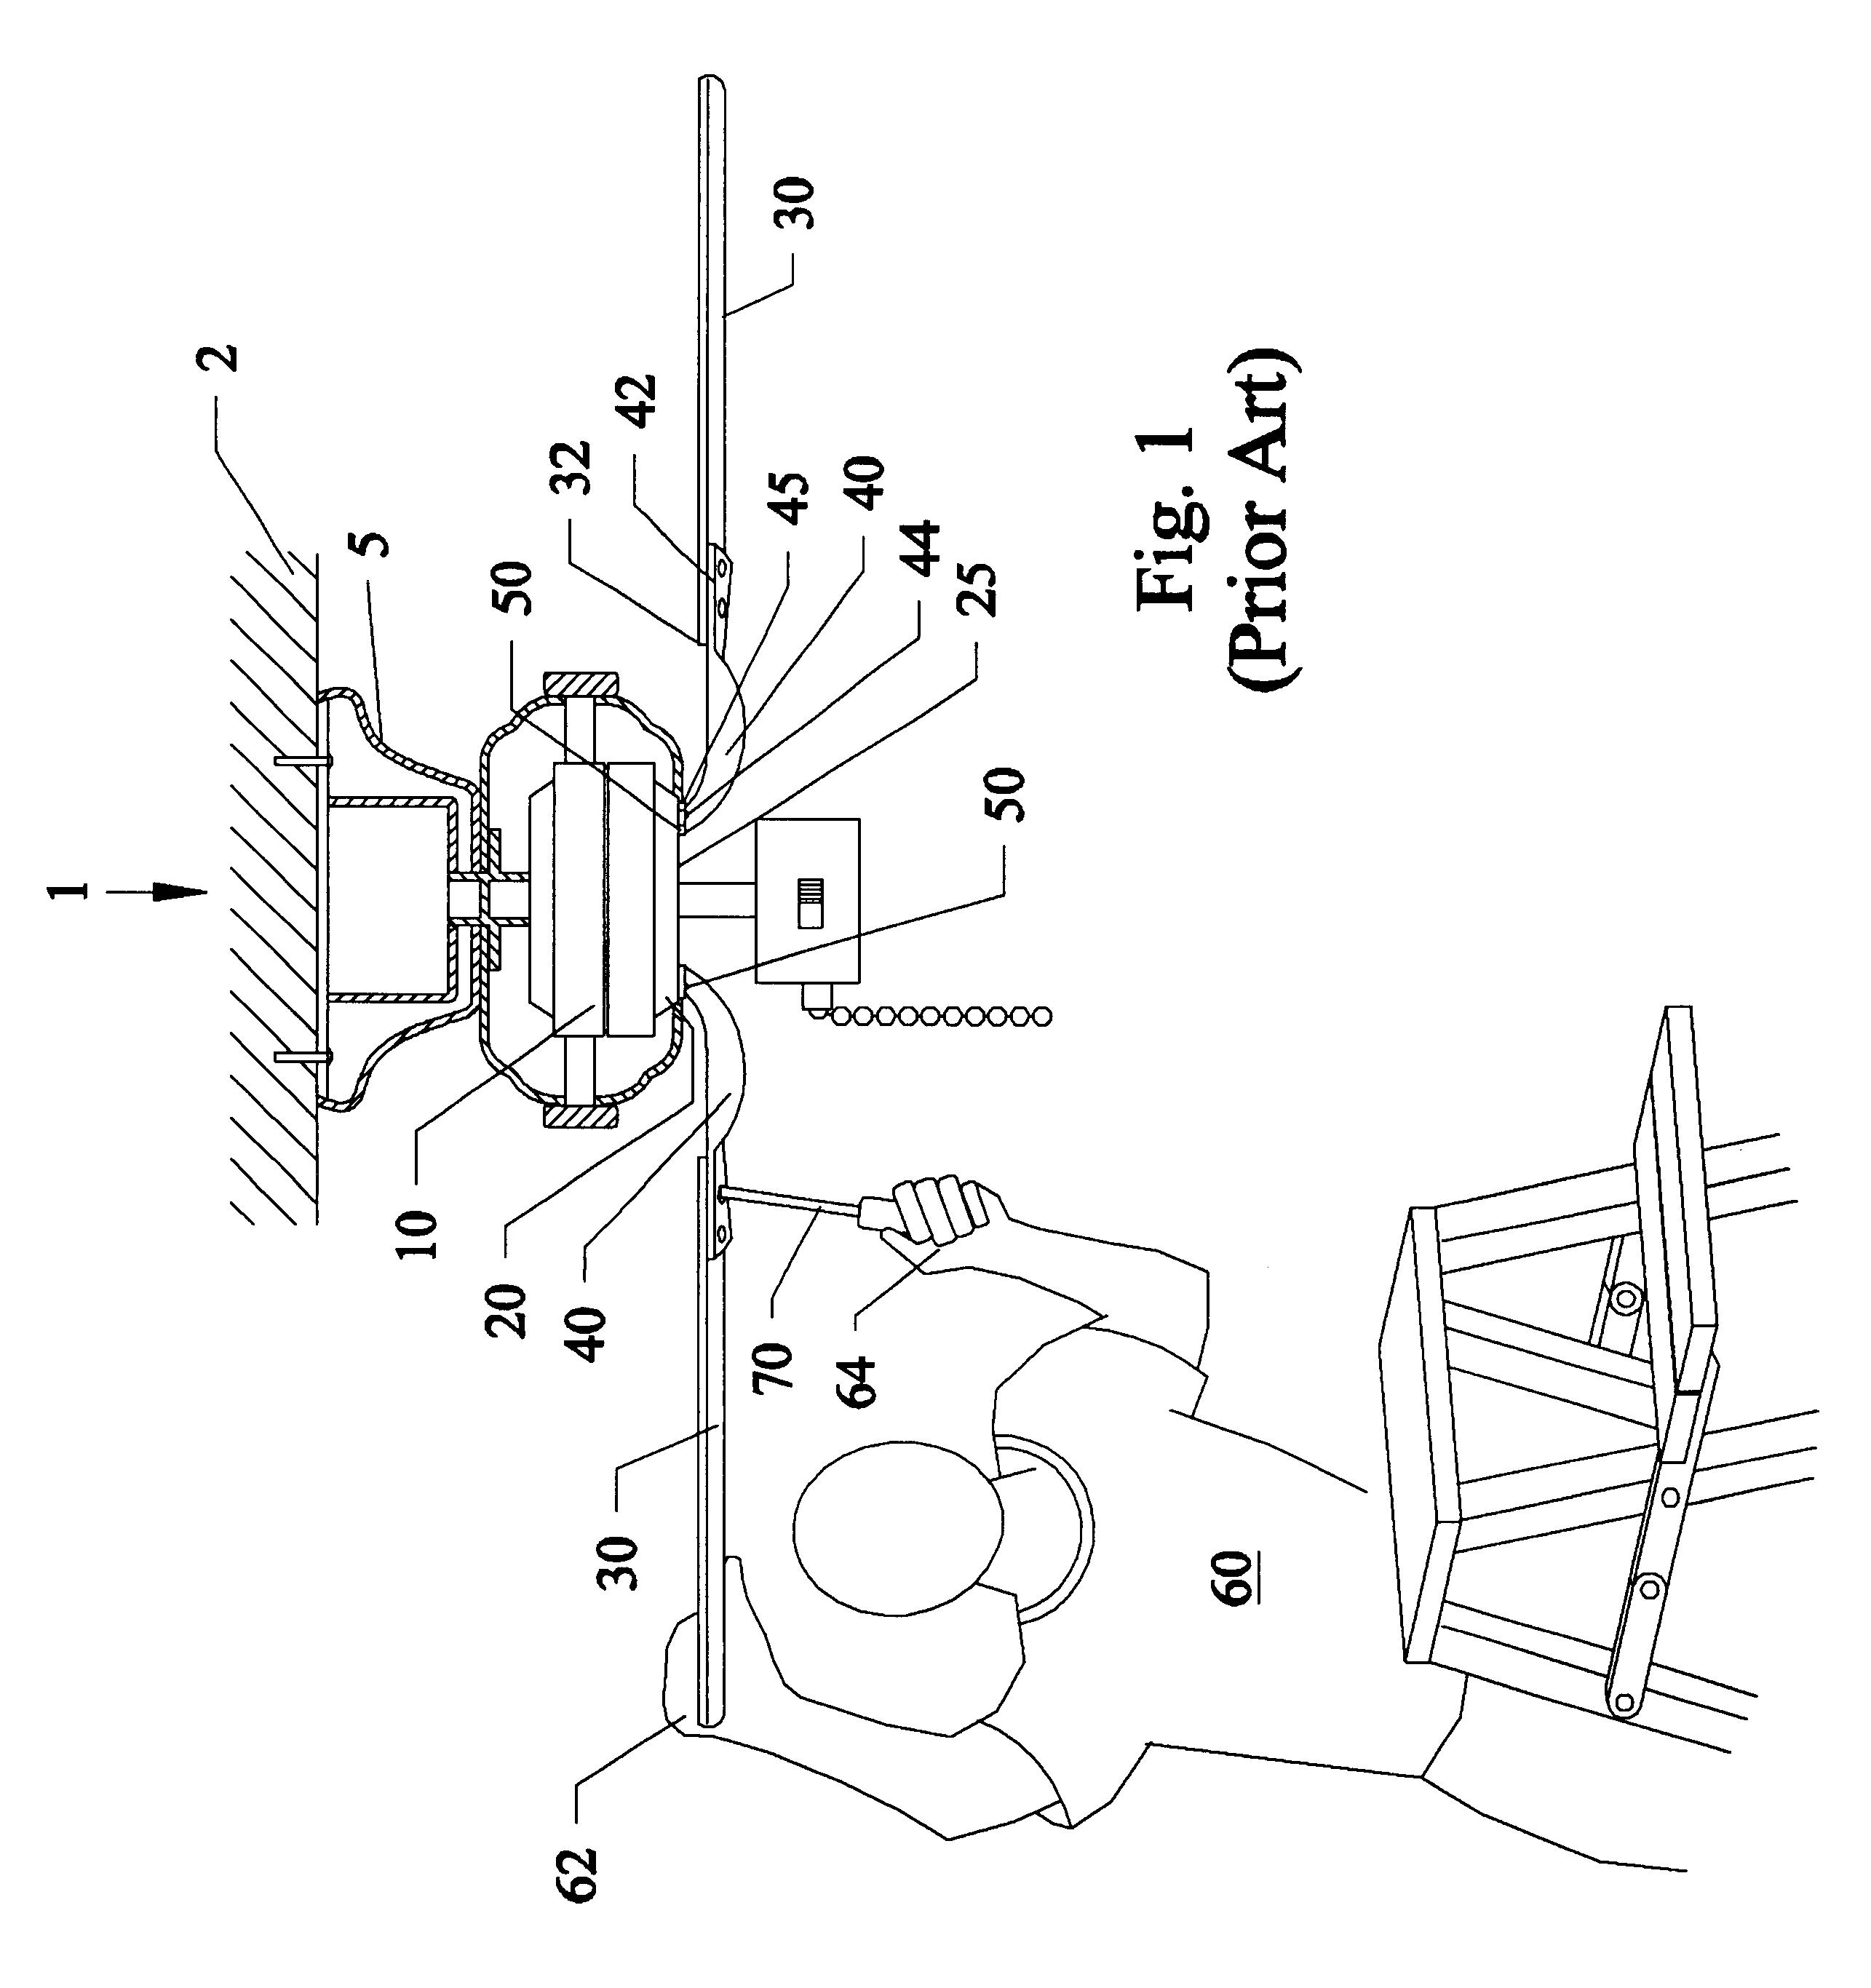 russound wiring diagrams amx wiring diagram tripp lite wiring diagram proper wiring for ceiling fan on russound wiring diagrams